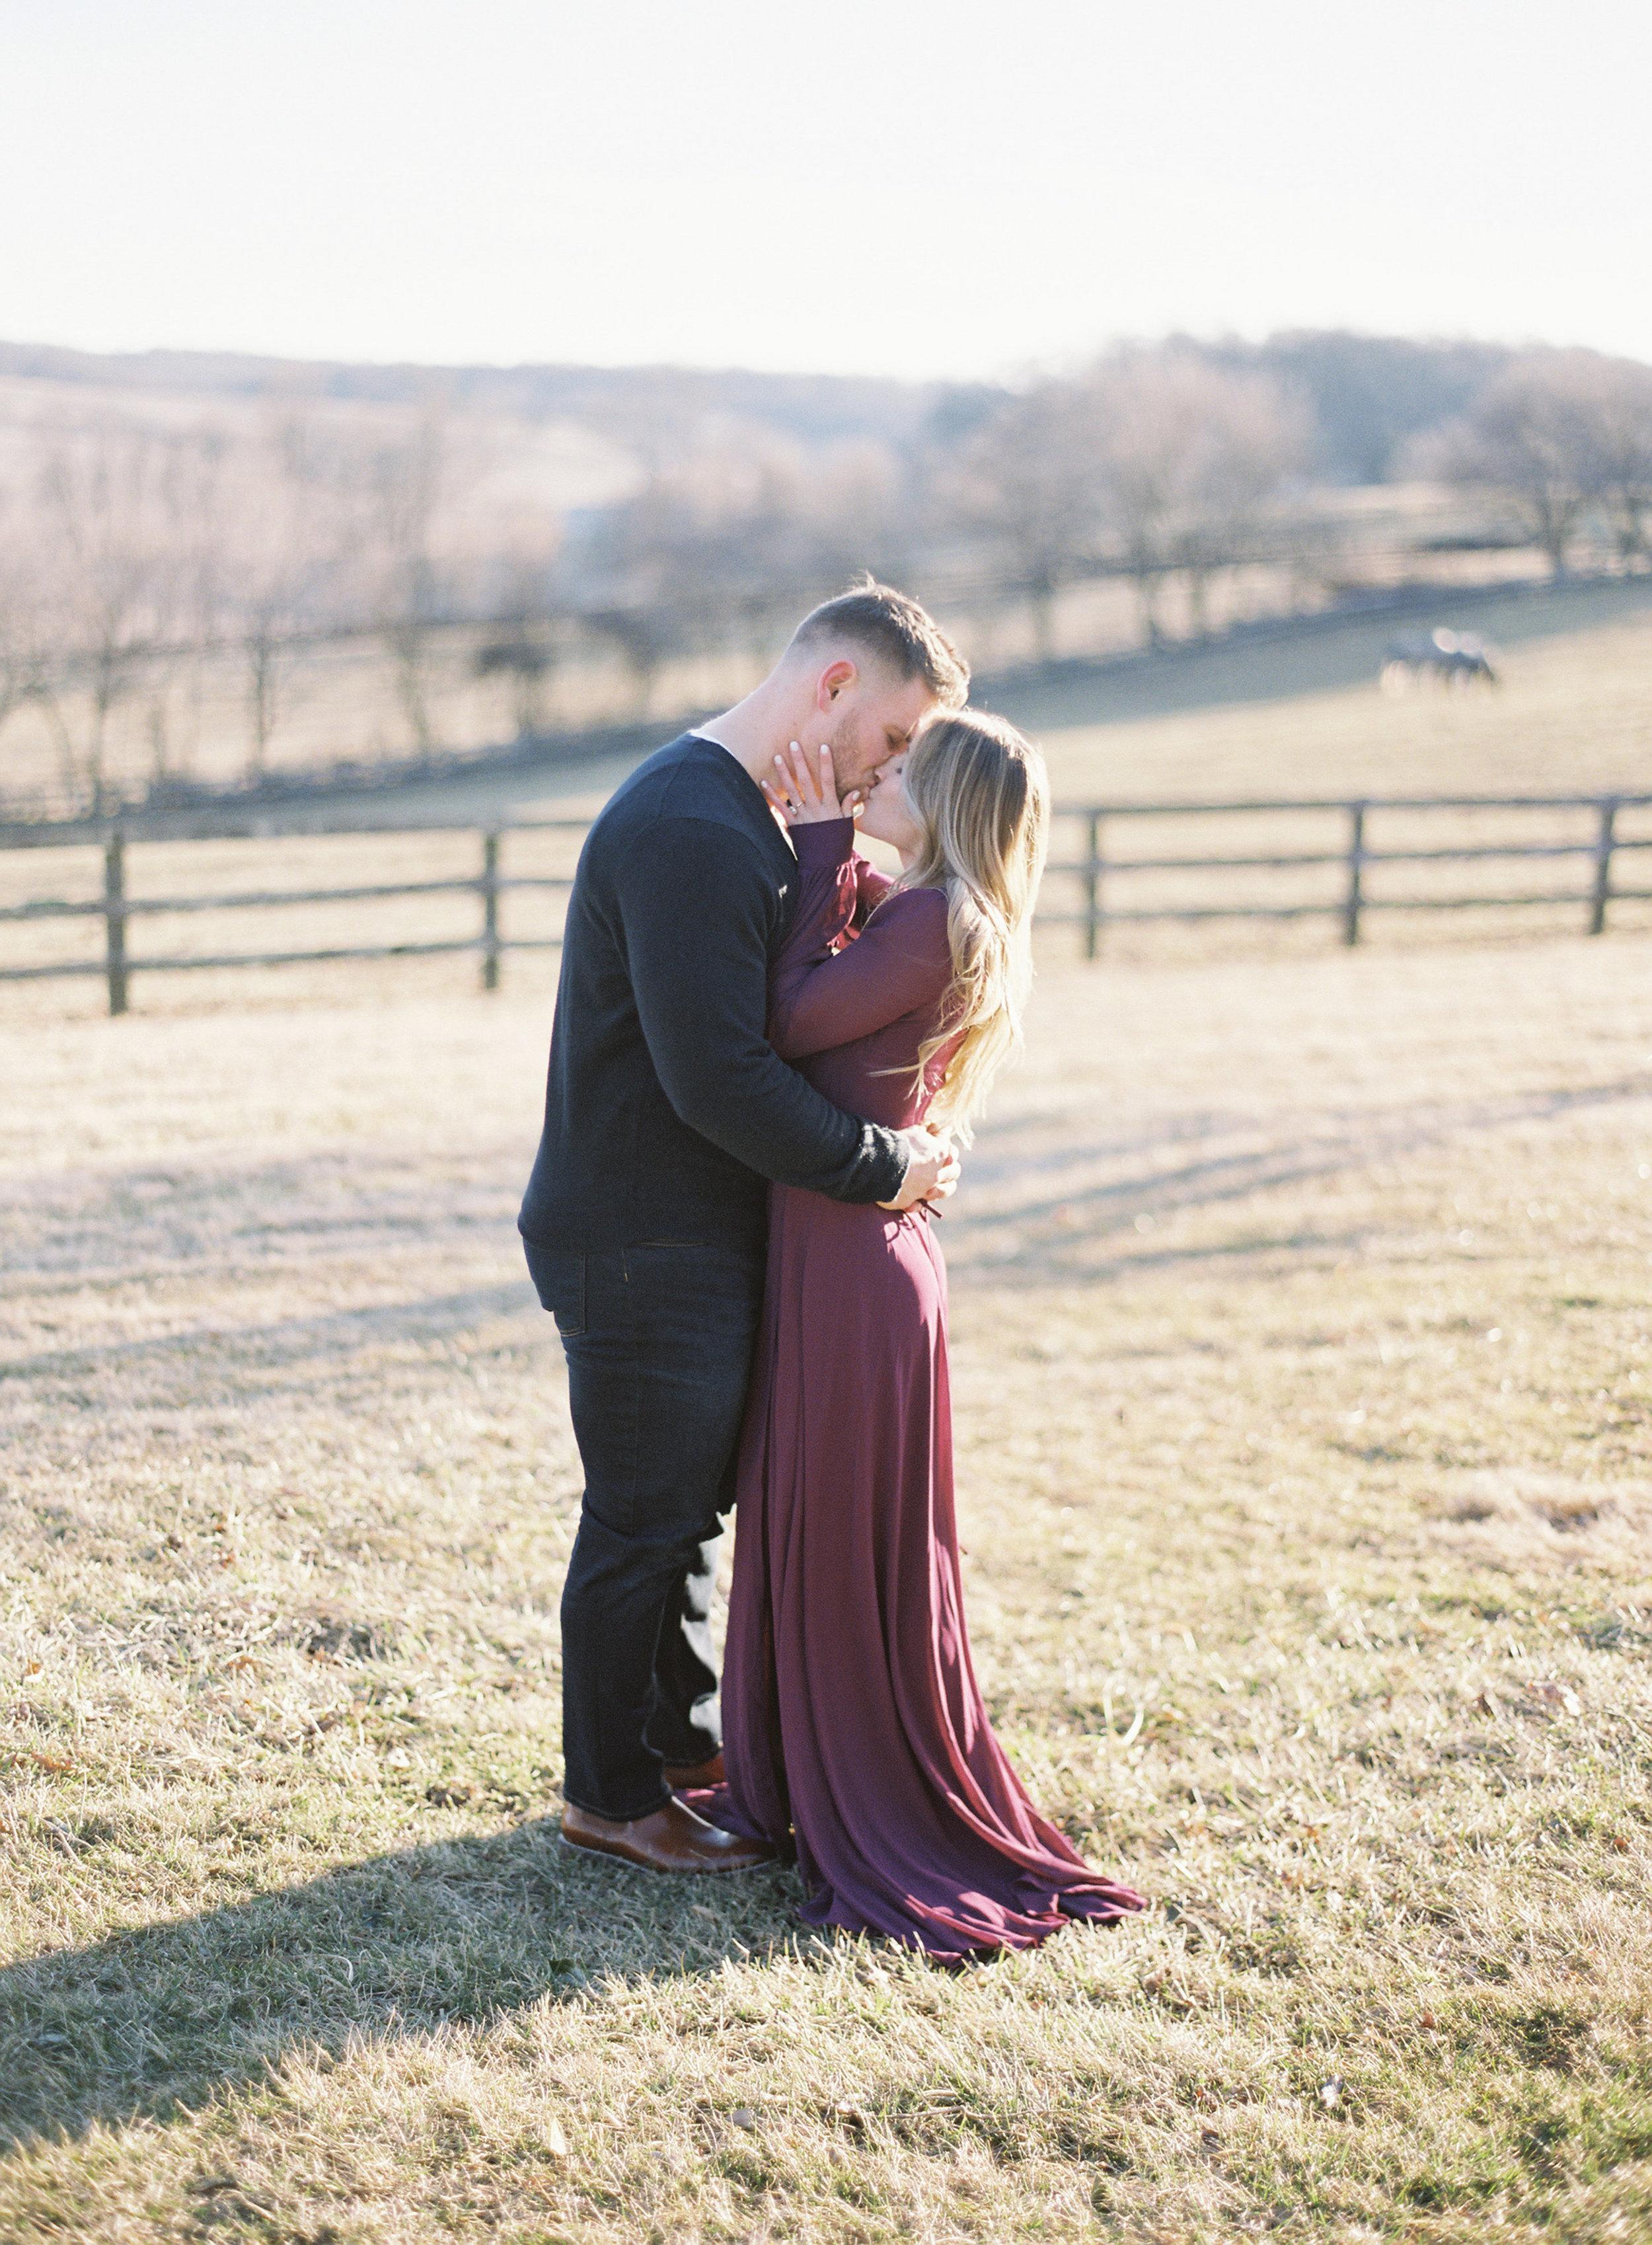 Mike & Kirsten February 2019 Engagement-0010.jpg